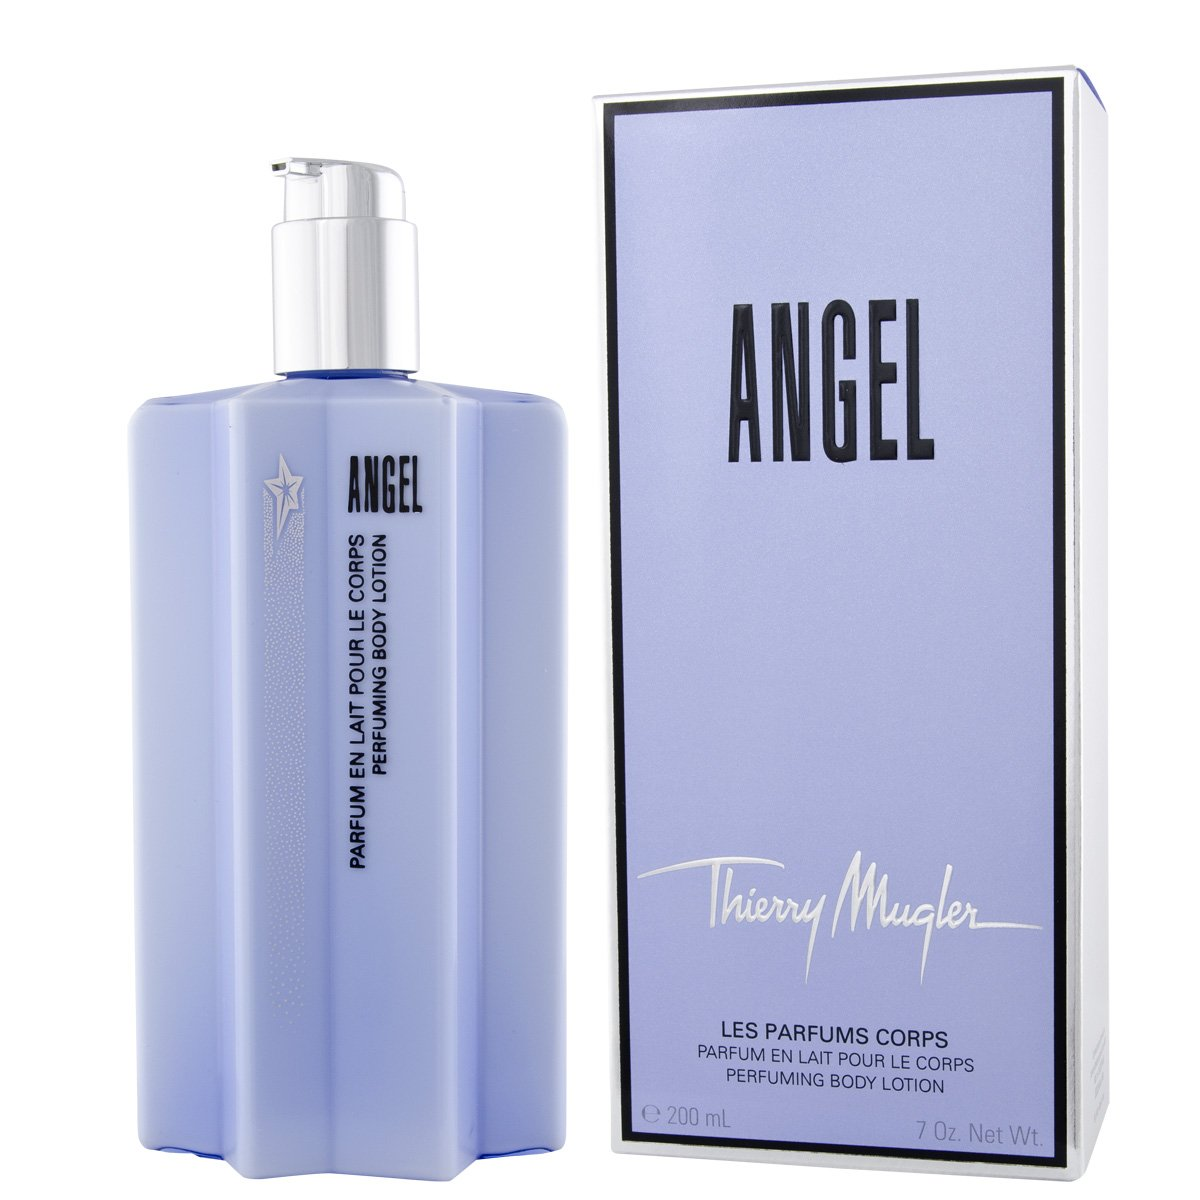 Thierry Mugler Angel Body Lotion - 200ml